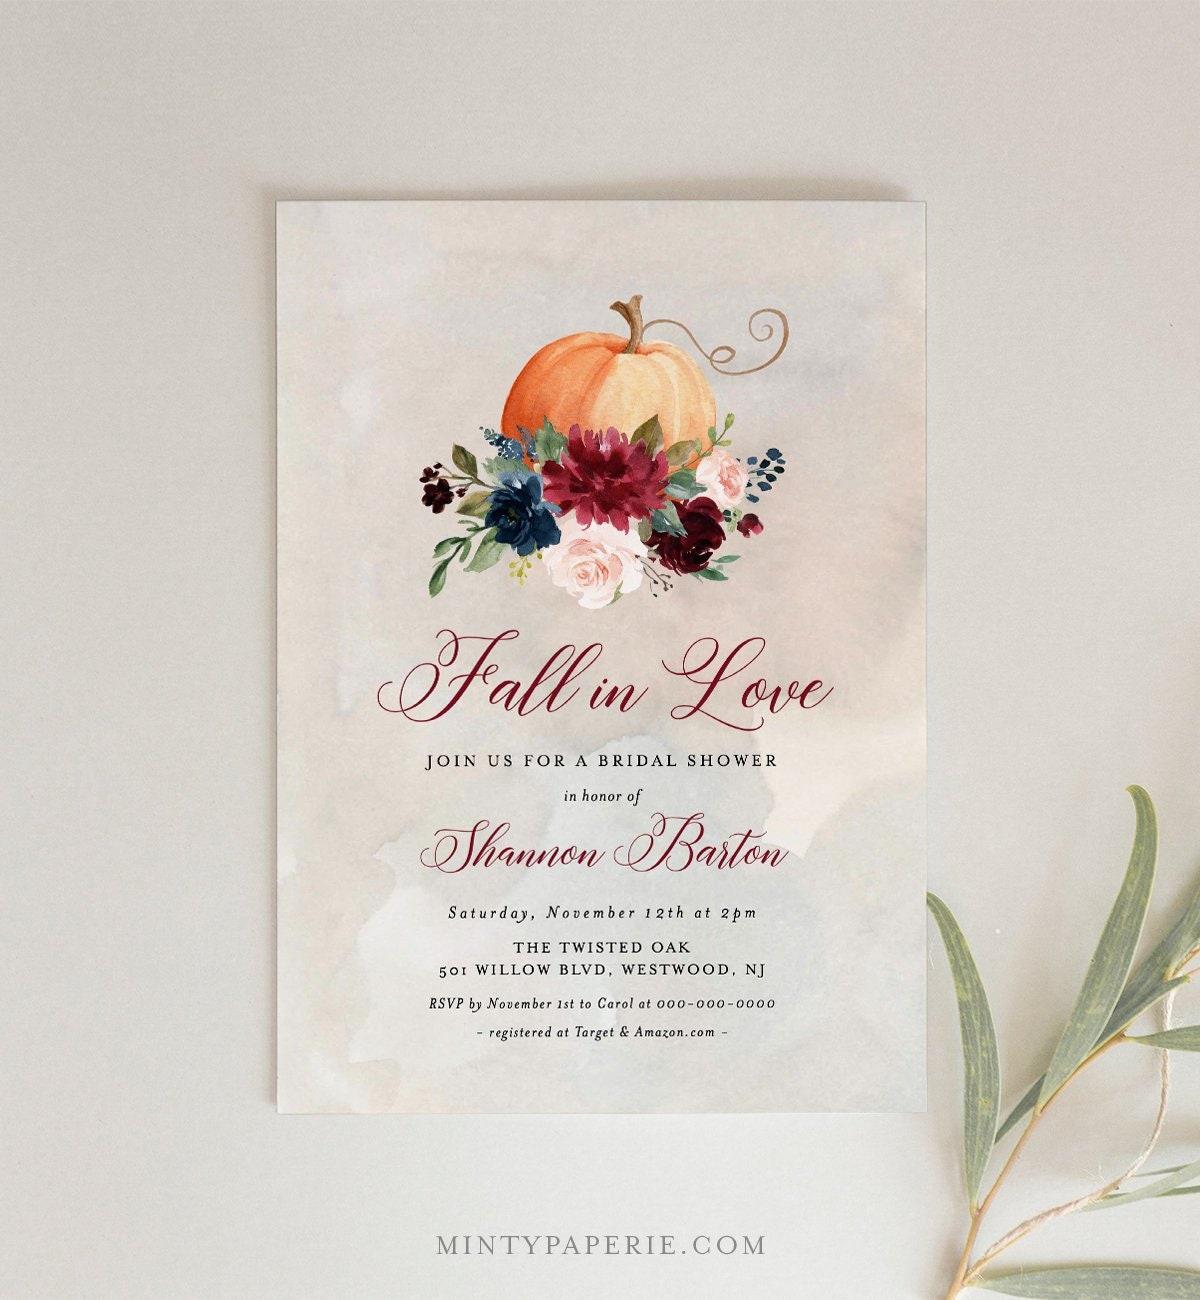 Fall Bridal Shower Invitation Download Instant Download Autumn Wedding Pumpkin Invitation Template Printable Invitation